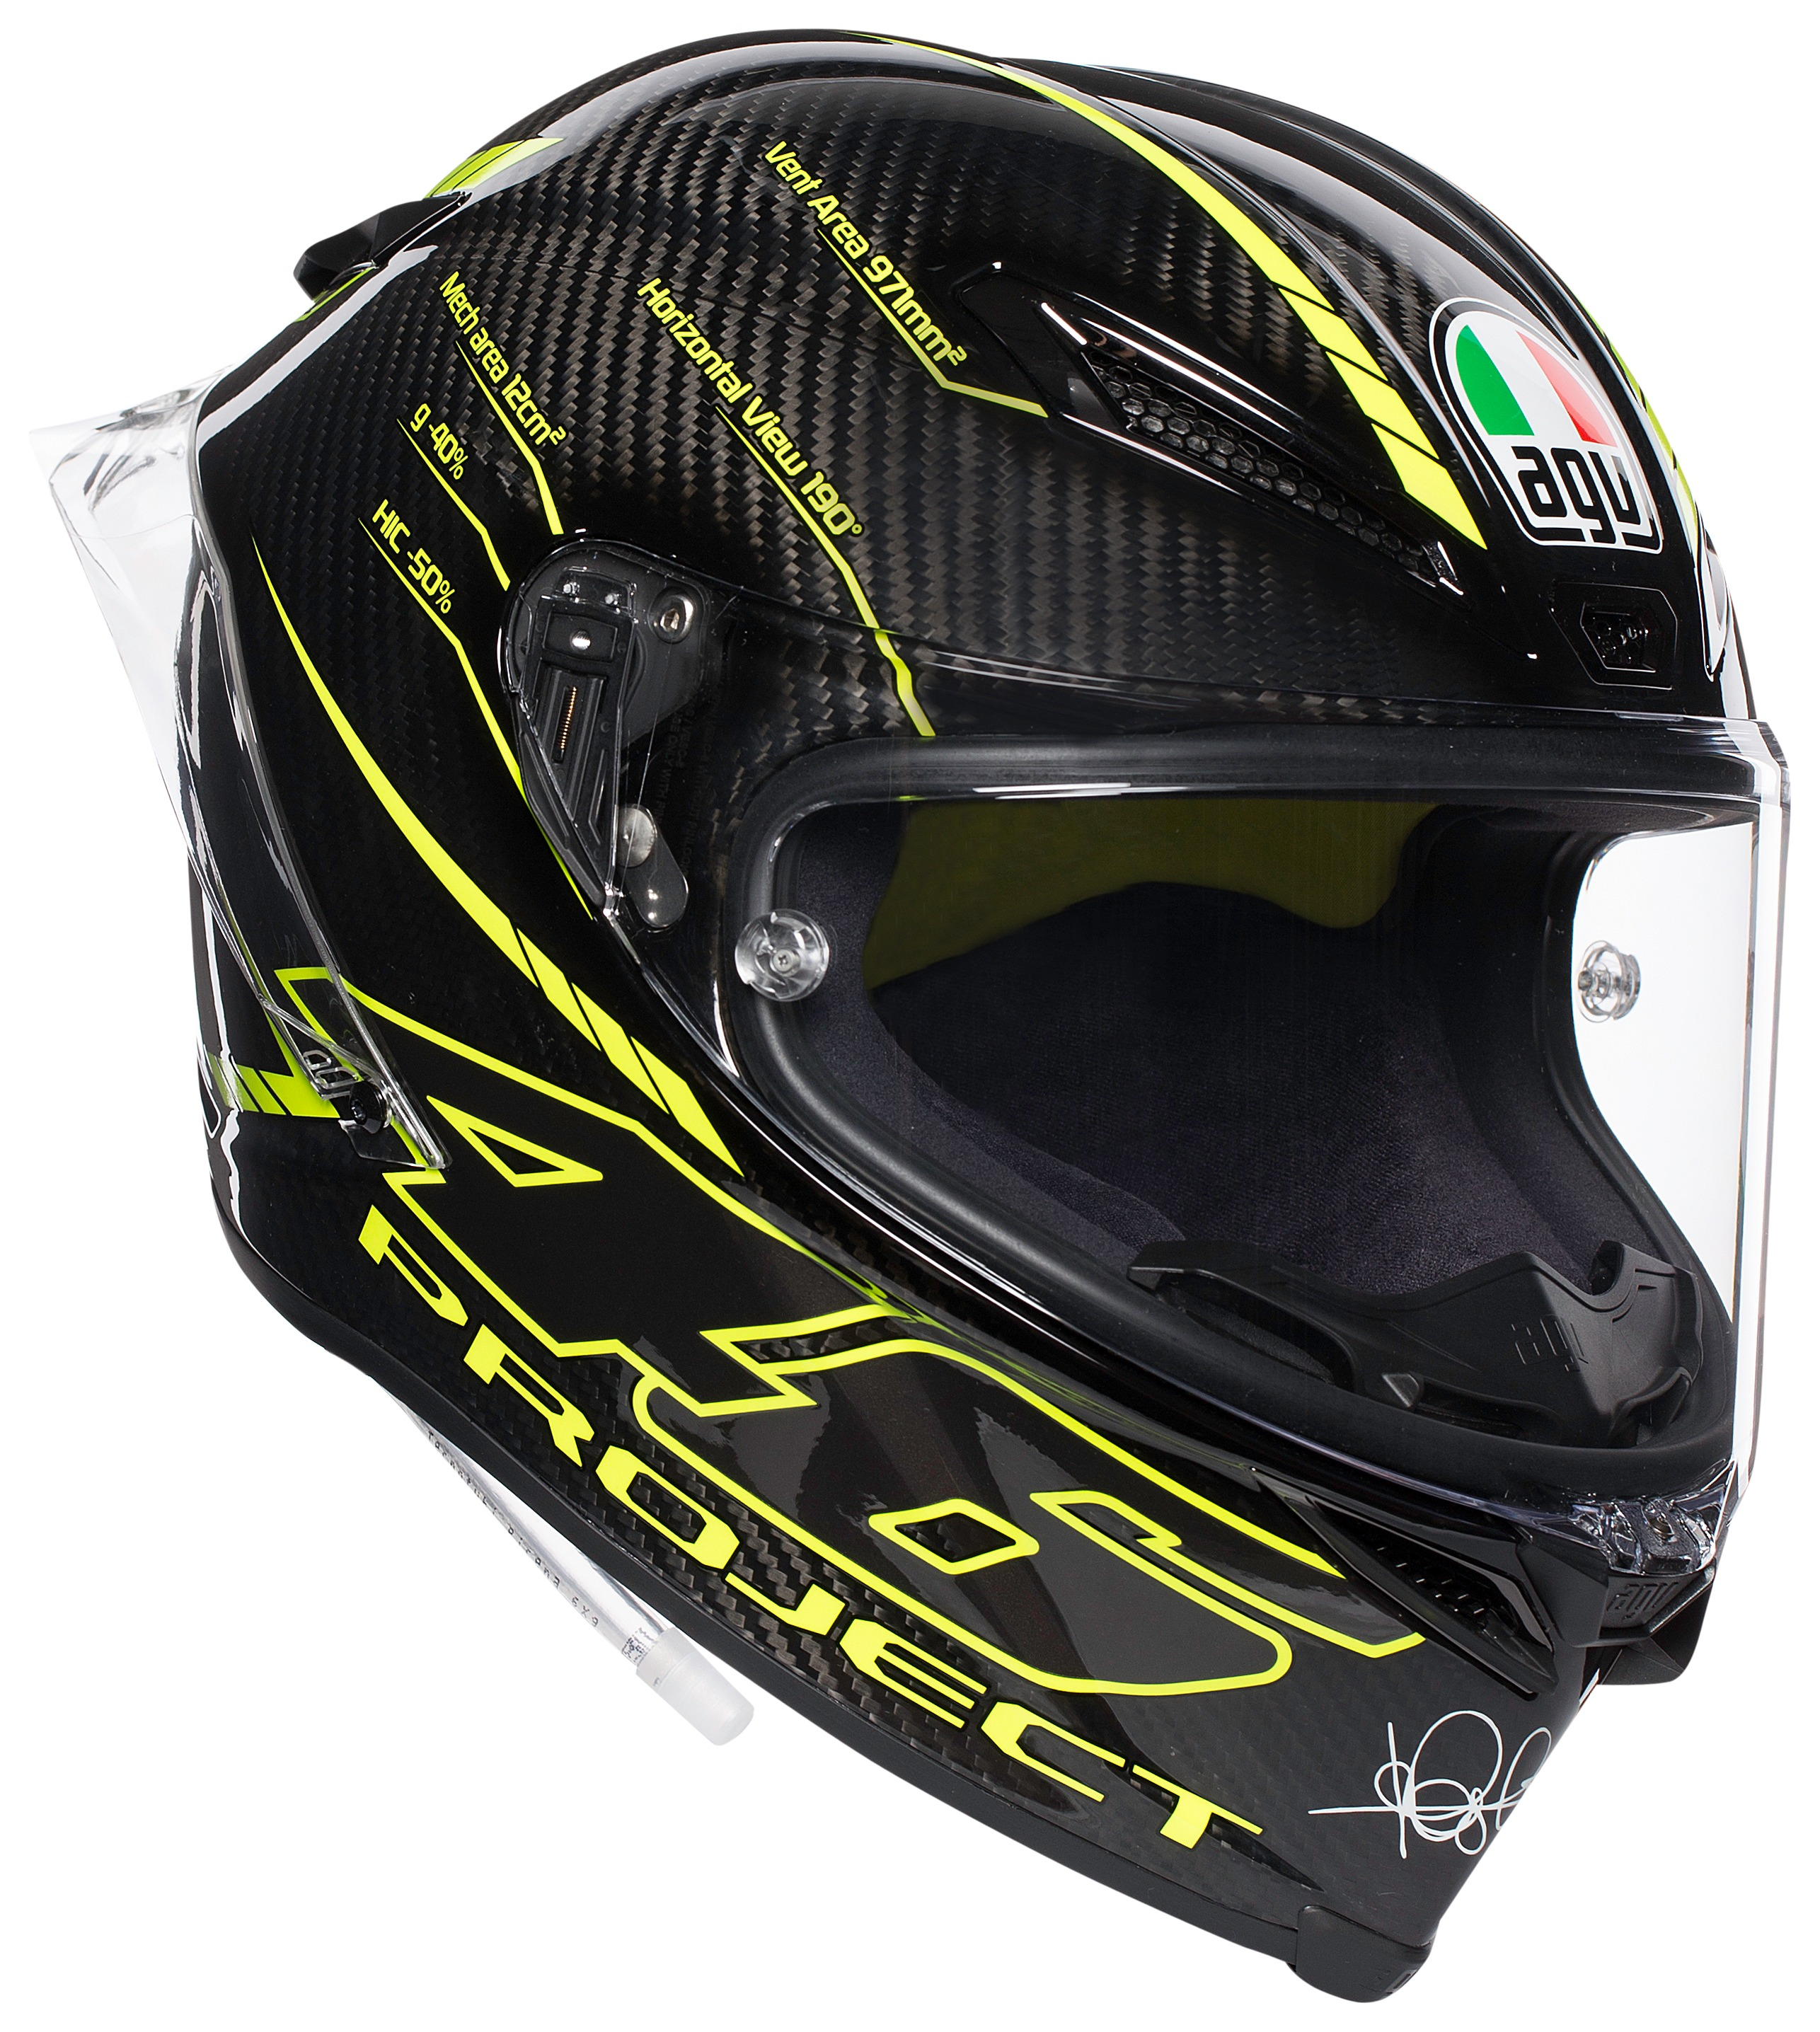 AGV Pista GP R Carbon Helmet - RevZilla